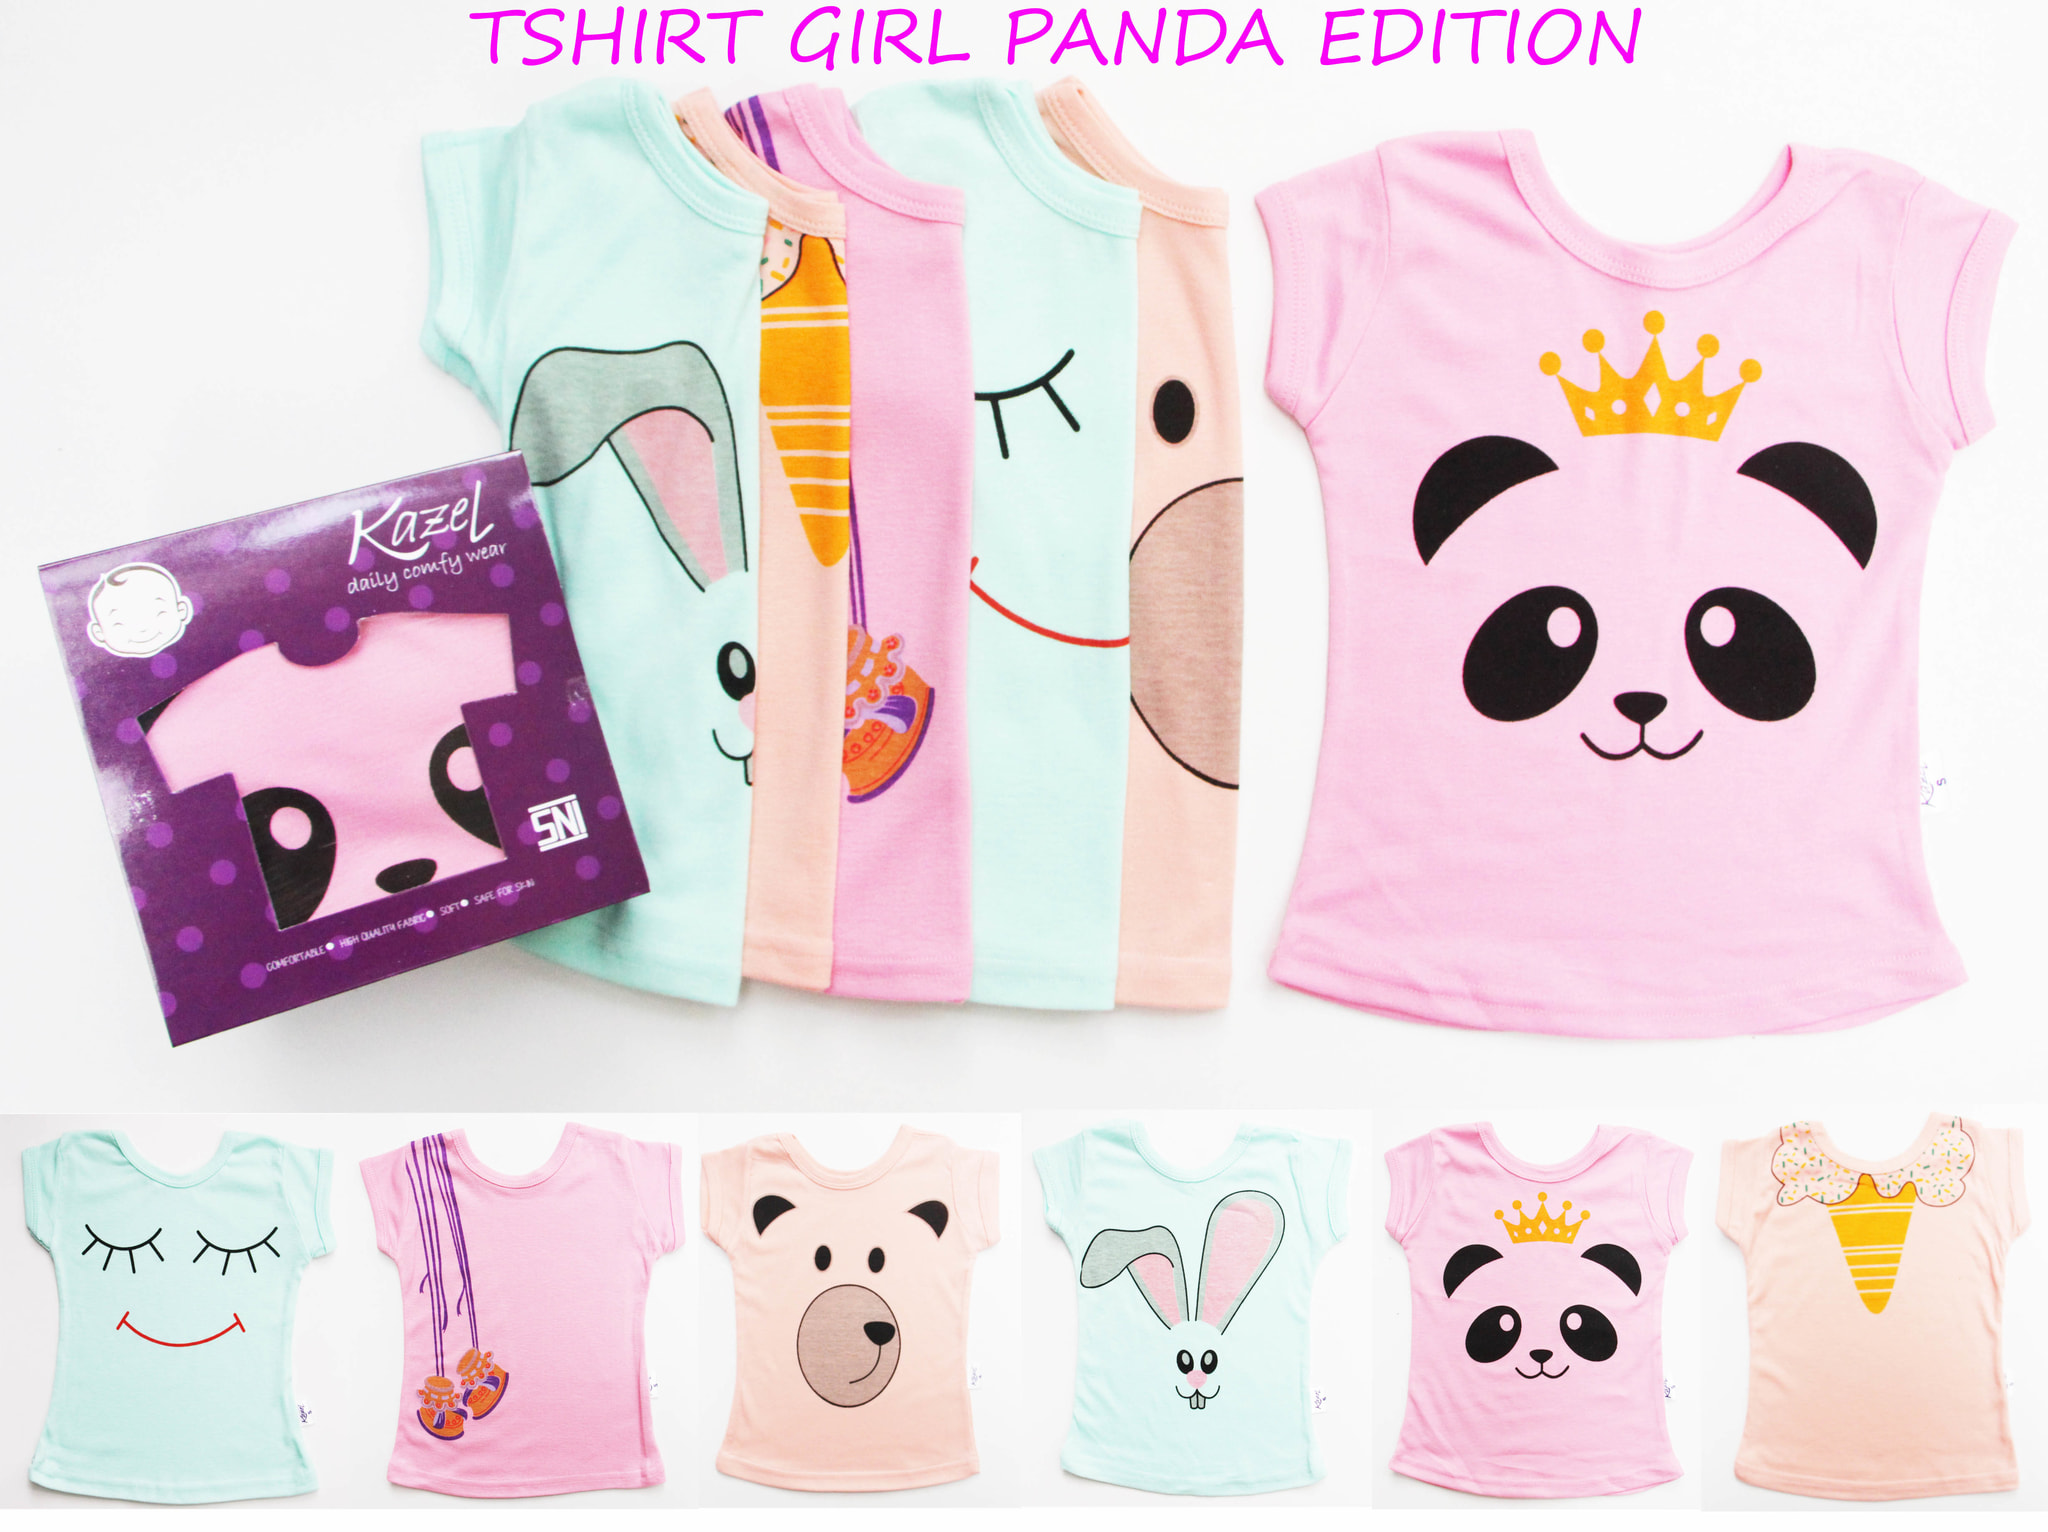 Jual Kazel Tshirt Panda Edition Kaos Bayi Anak Baju Tambahan Packing Bubble Lucu Starlight Shop Cs Tokopedia